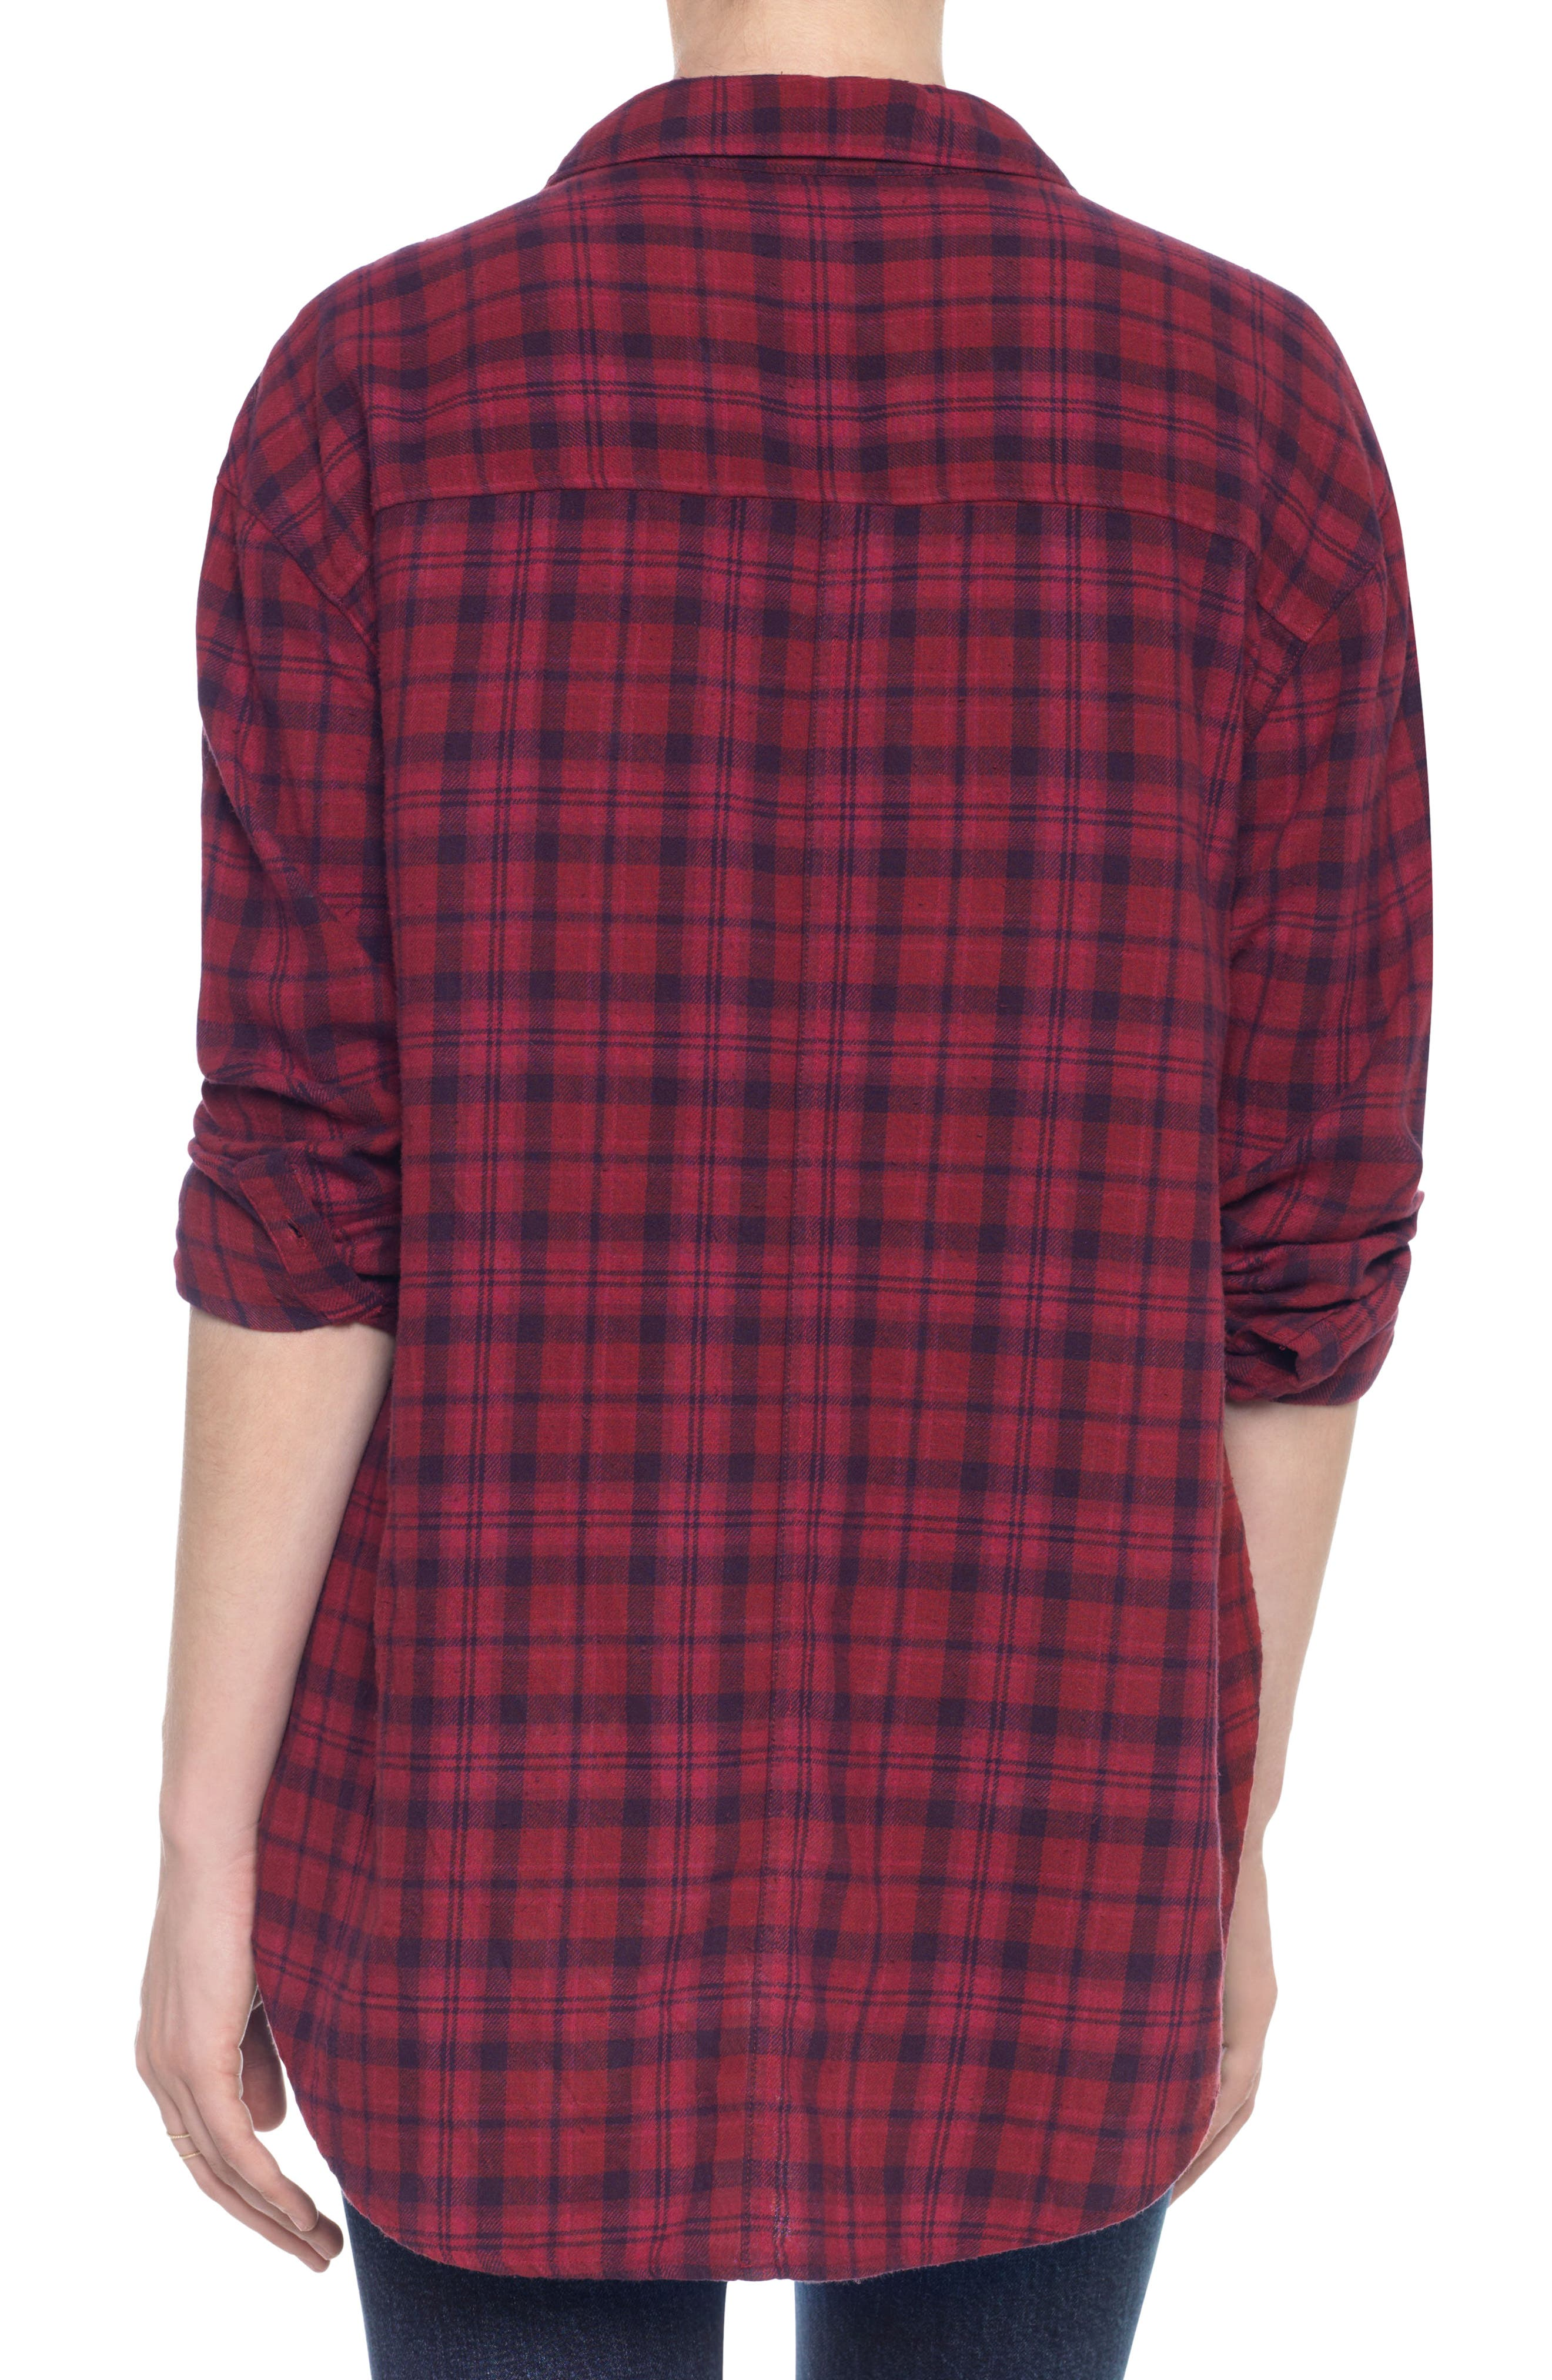 Alternate Image 3  - Taylor Hill x Joe's Boyfriend Flannel Shirt